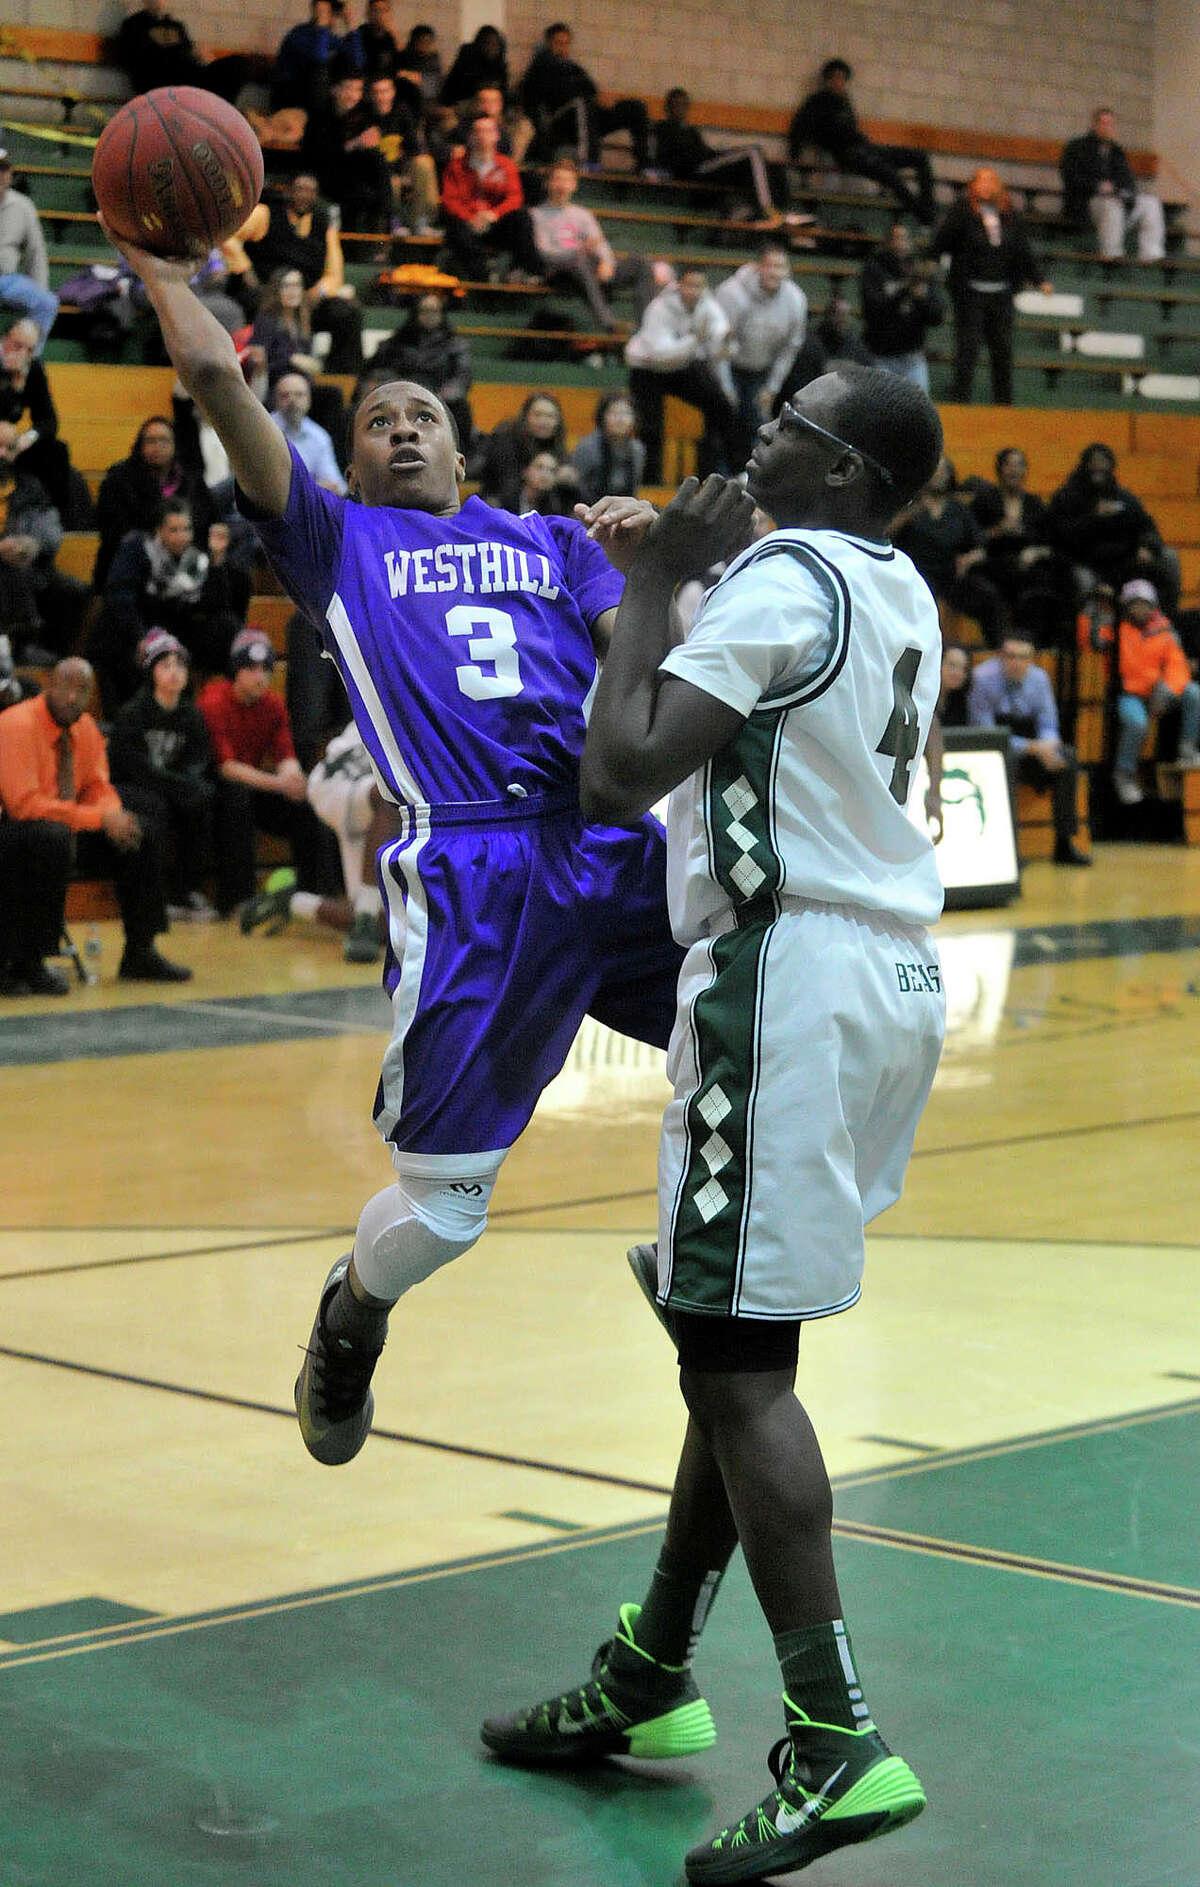 Westhill's C.J. Donaldson puts up a shot next to Norwalk's Roy Kane Jr during their basketball game at Norwalk High School in Norwalk, Conn., on Tuesday, Jan. 28, 2014. Westhill won, 68-56.